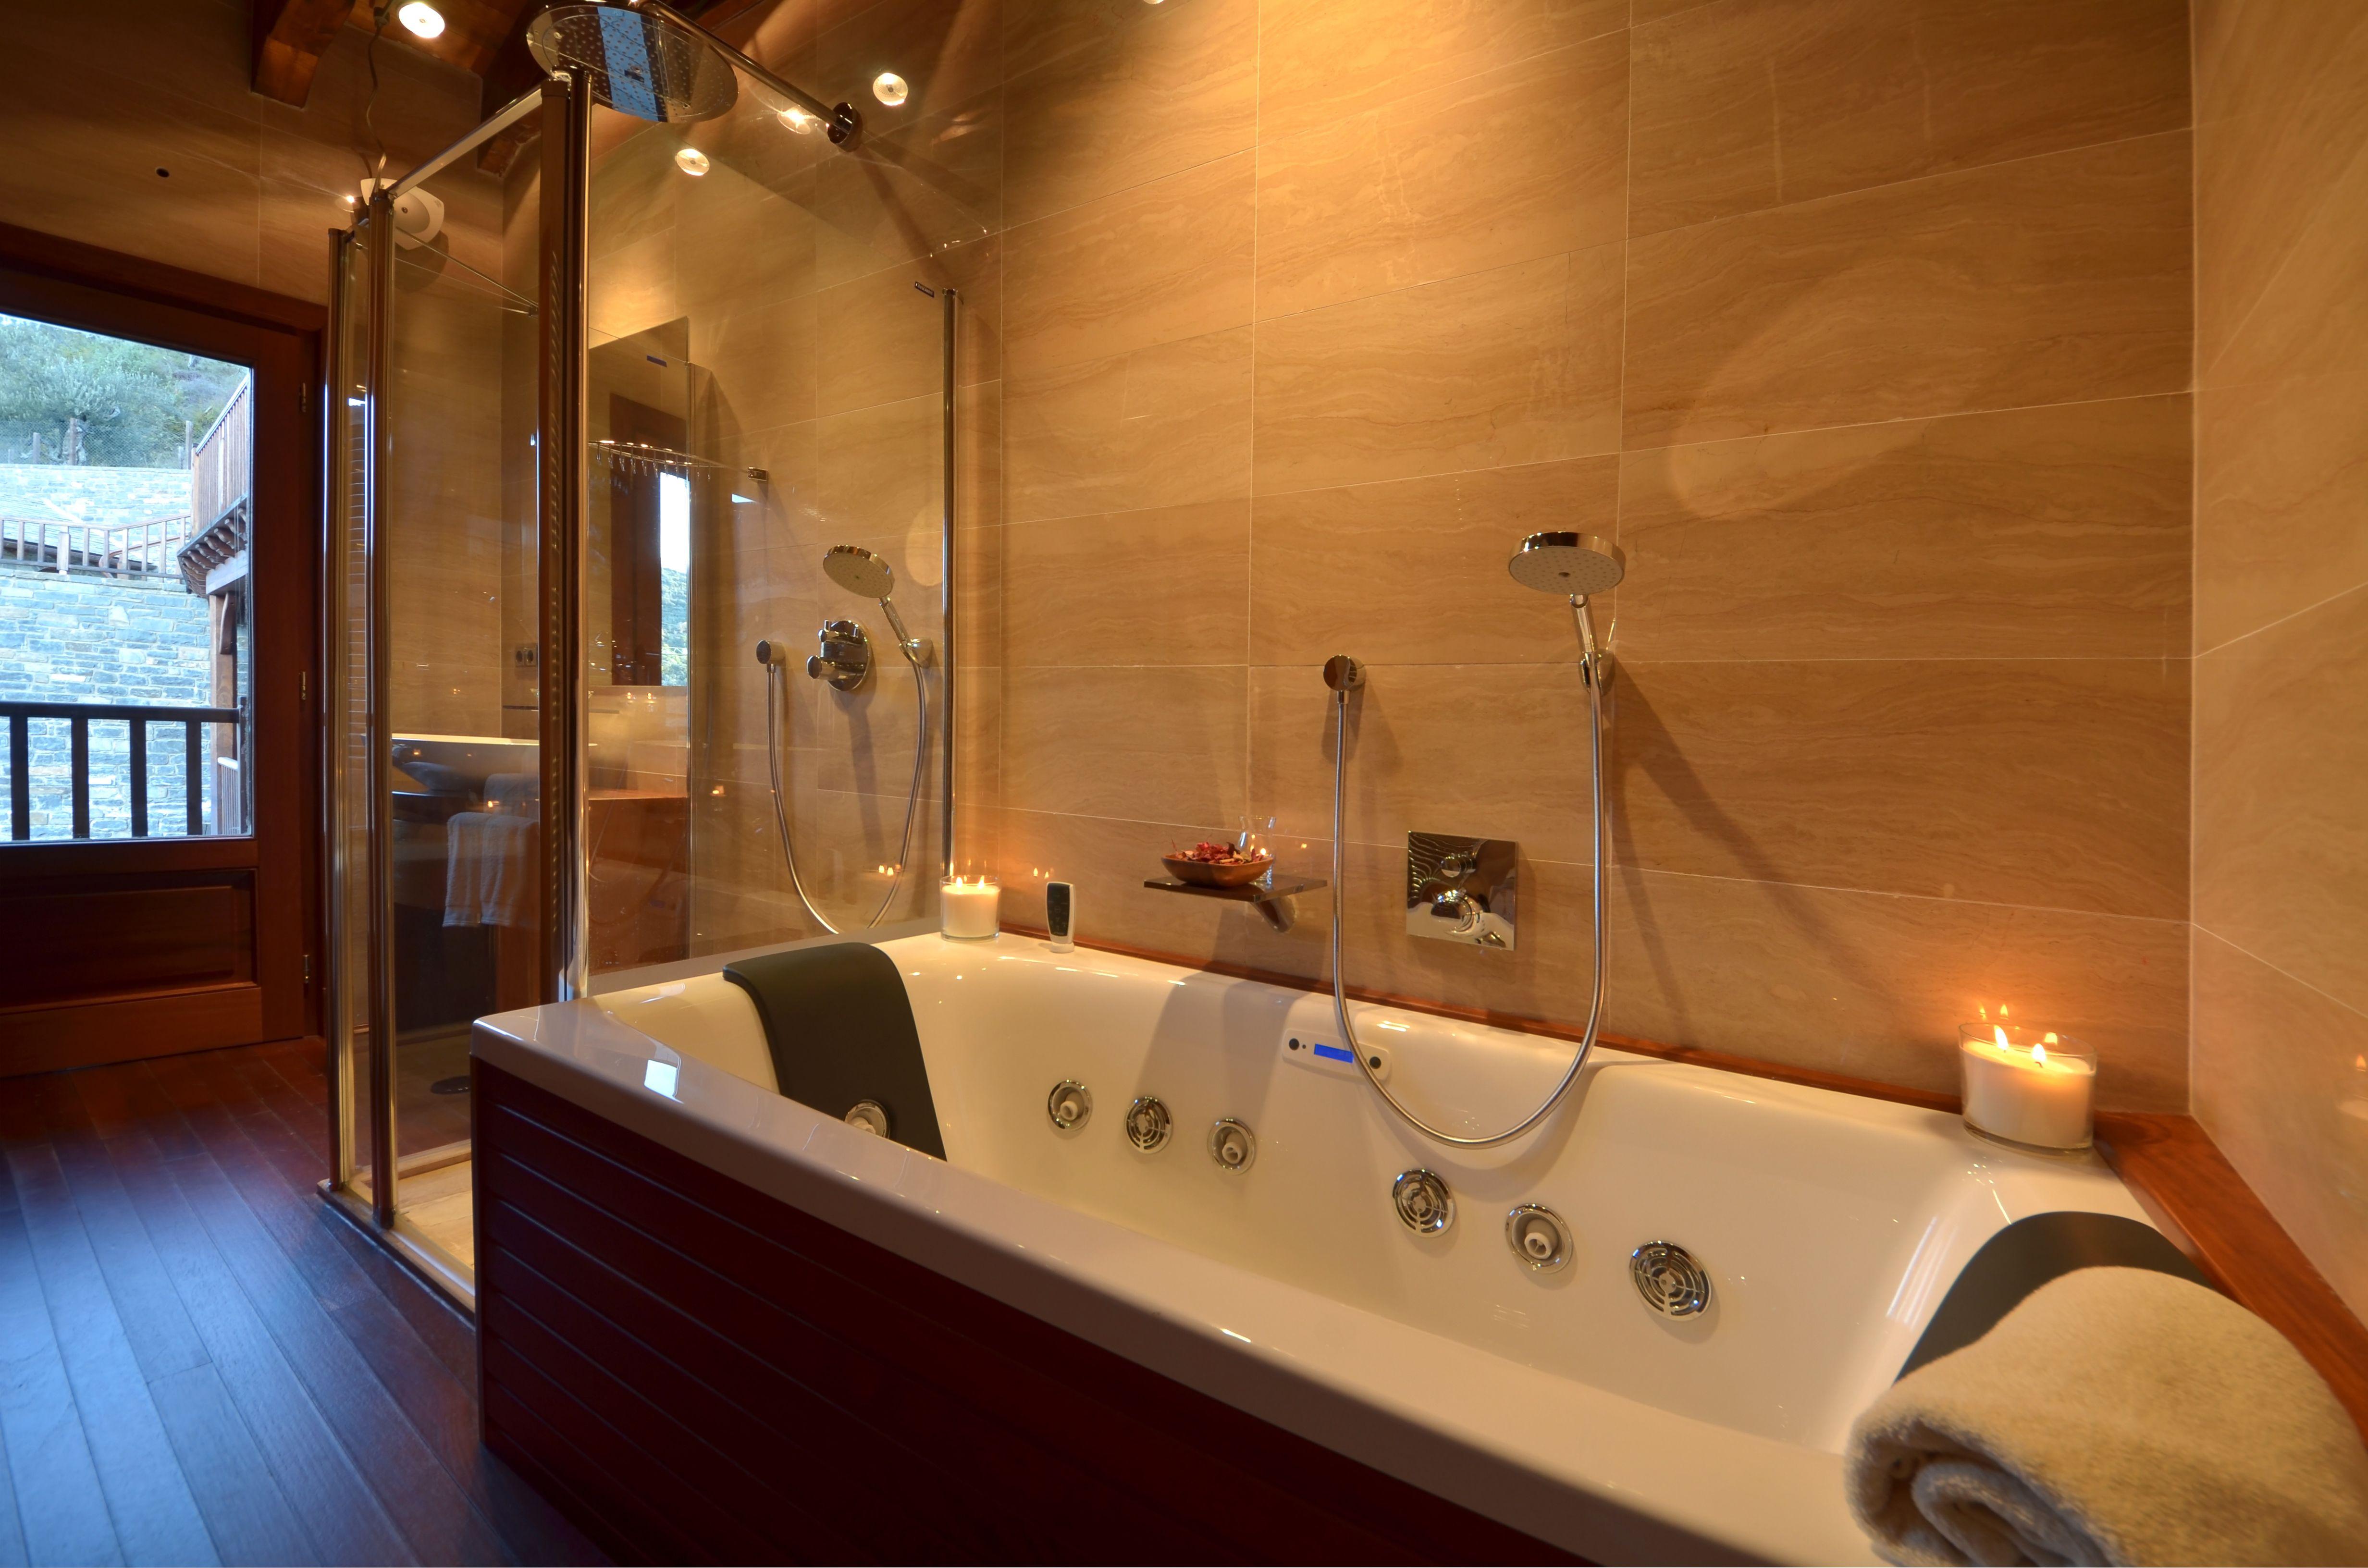 Cuarto de ba o completo con ducha ba era hidromasaje - Cuartos de aseo con ducha ...